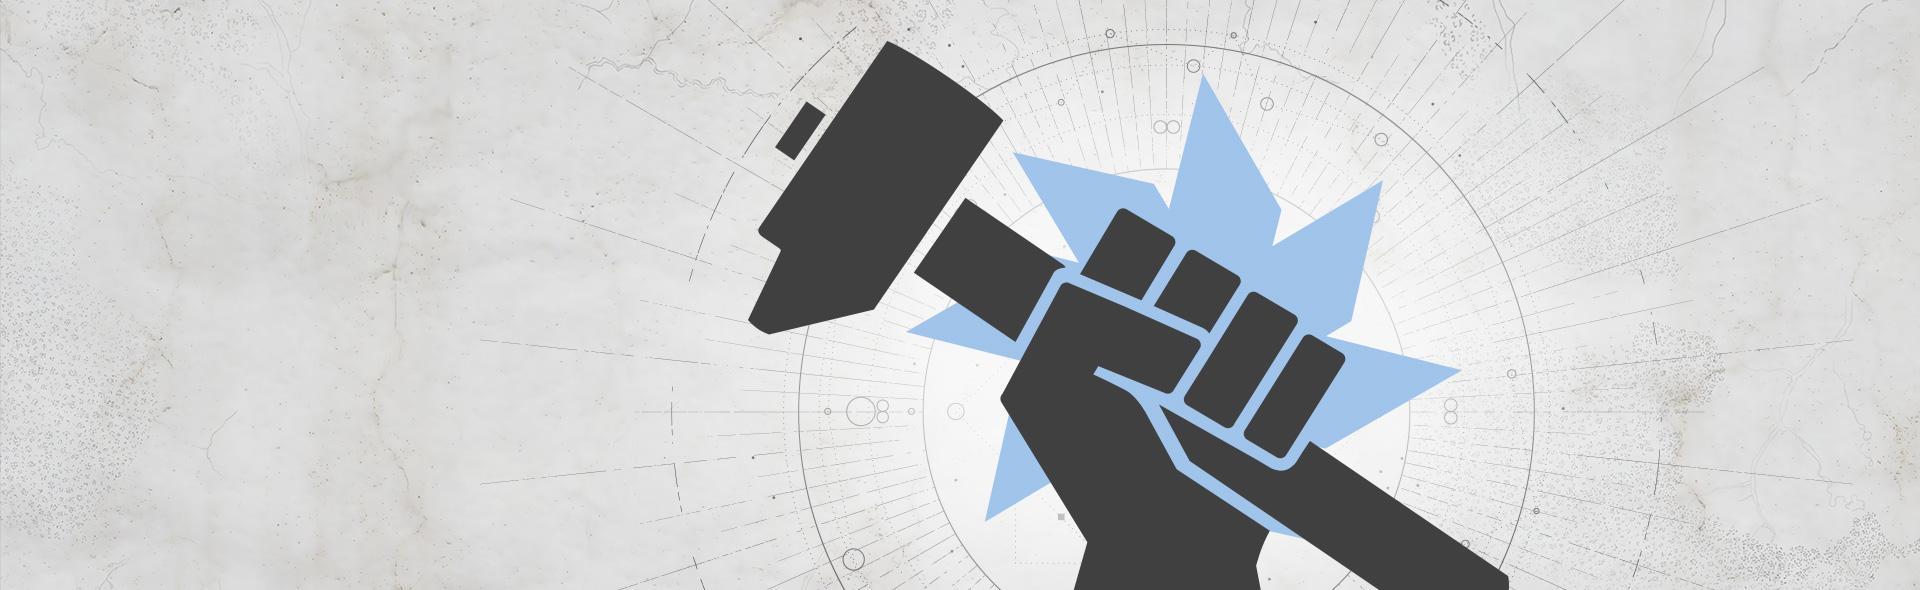 《天命2》更新檔3.0.2版